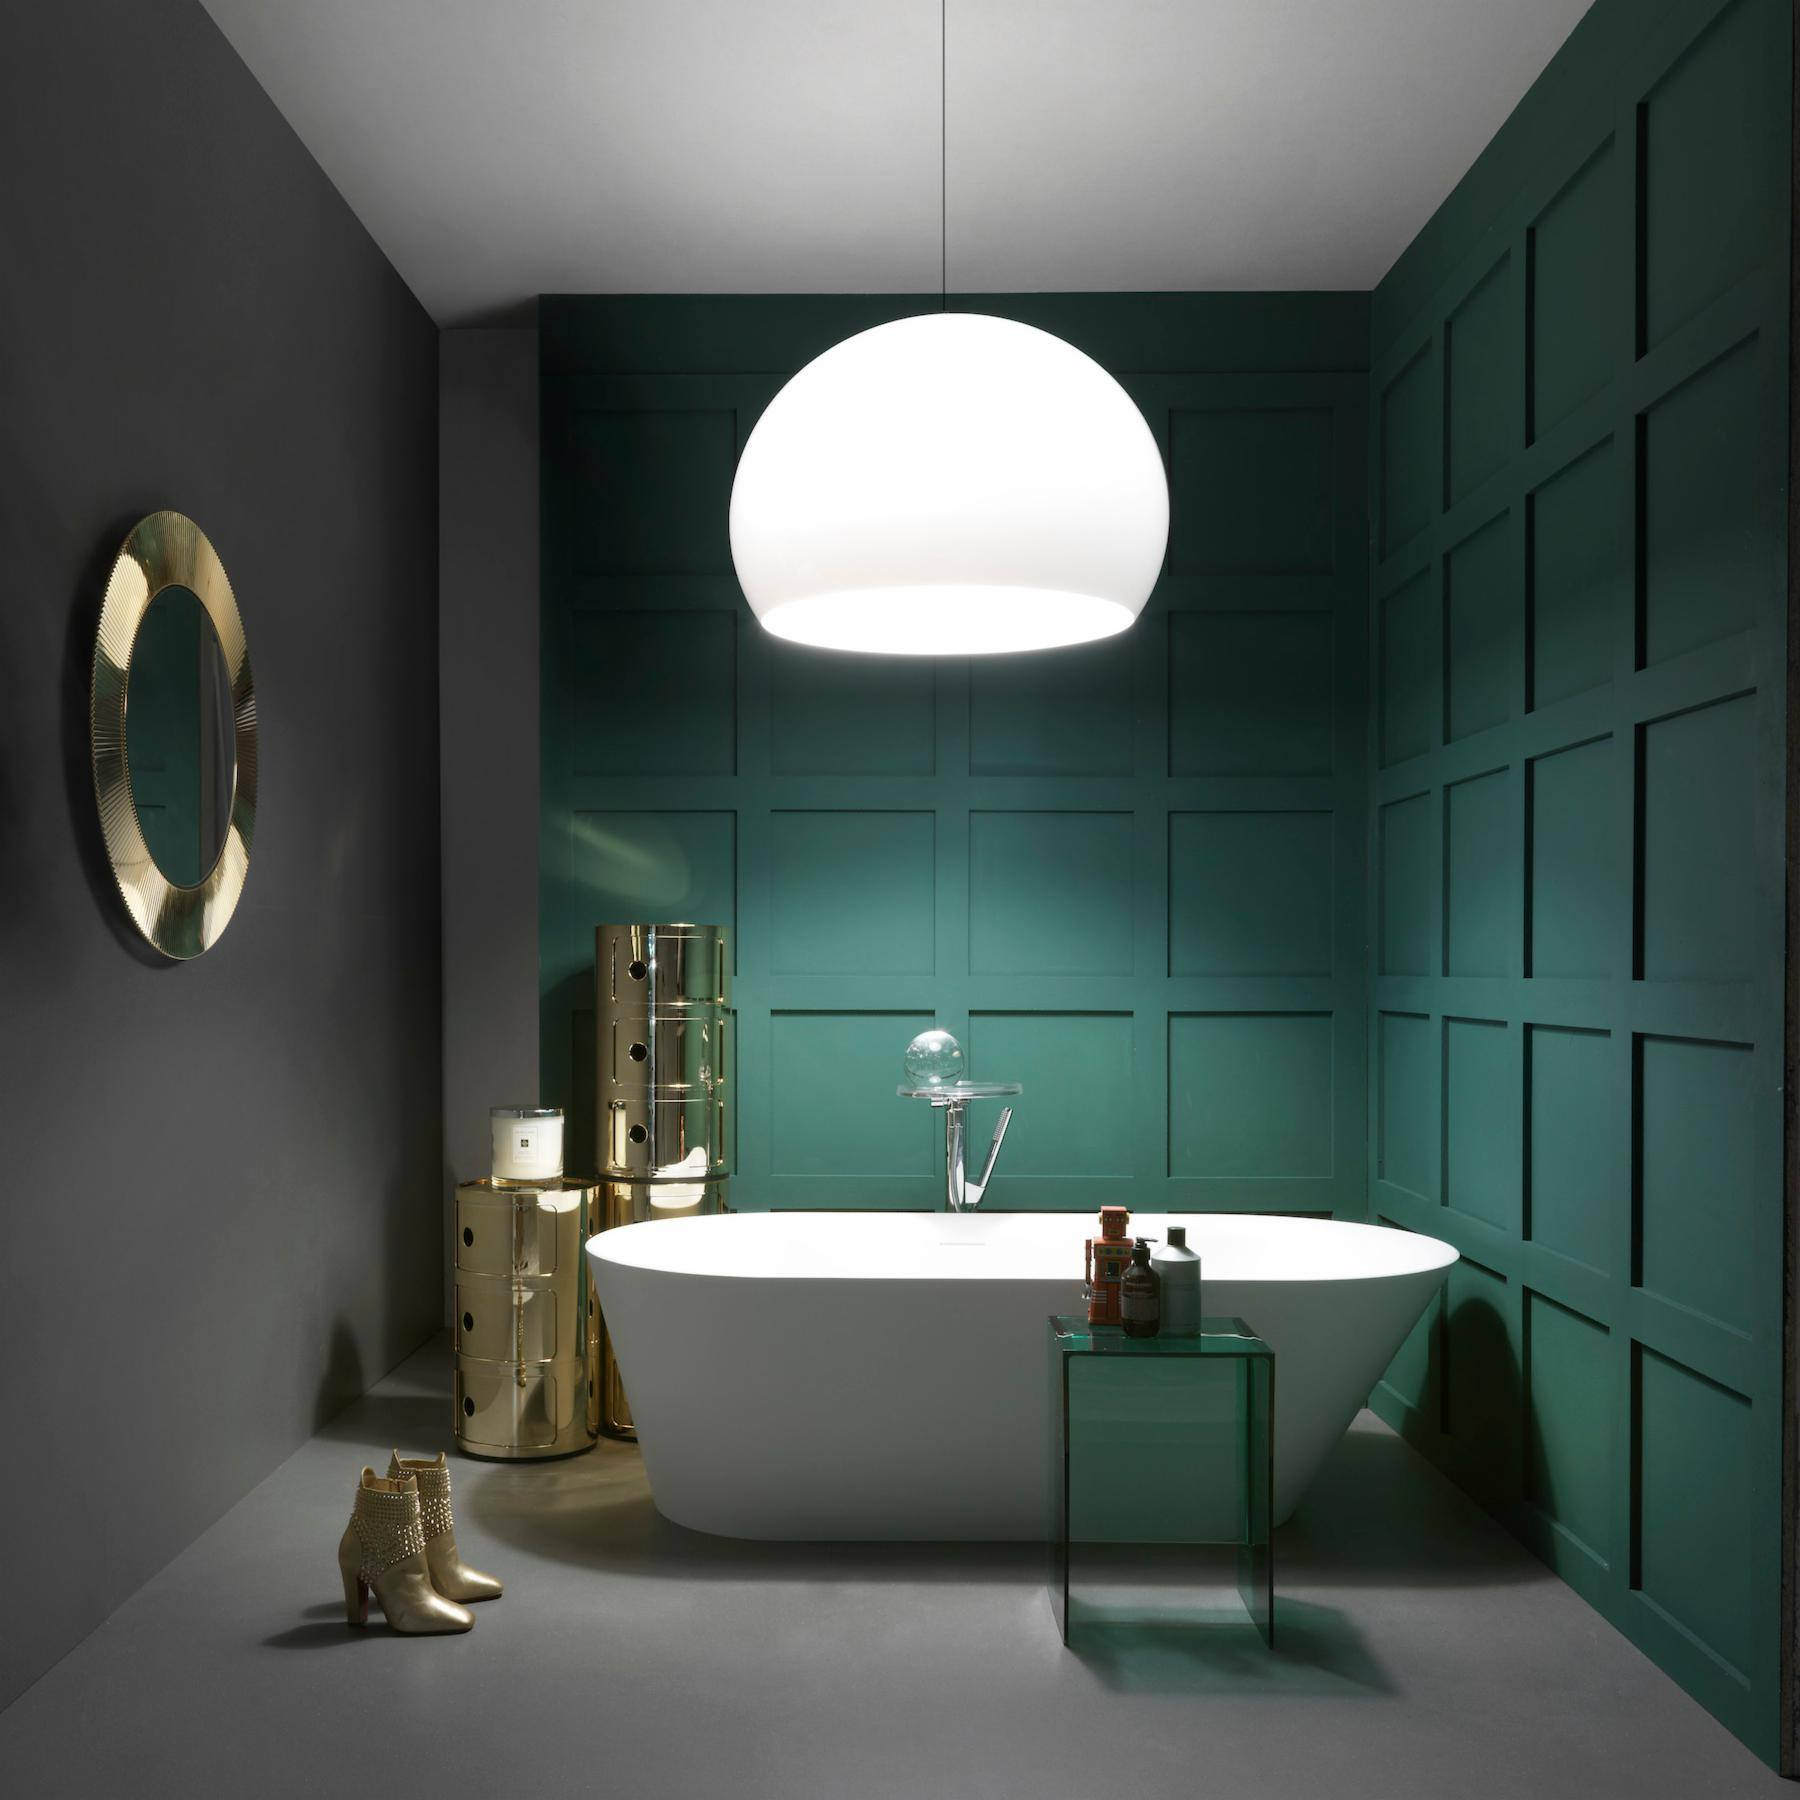 Wondrous Flow Bath And Kitchen Design Studio Glenside Pa Interior Design Ideas Gentotryabchikinfo